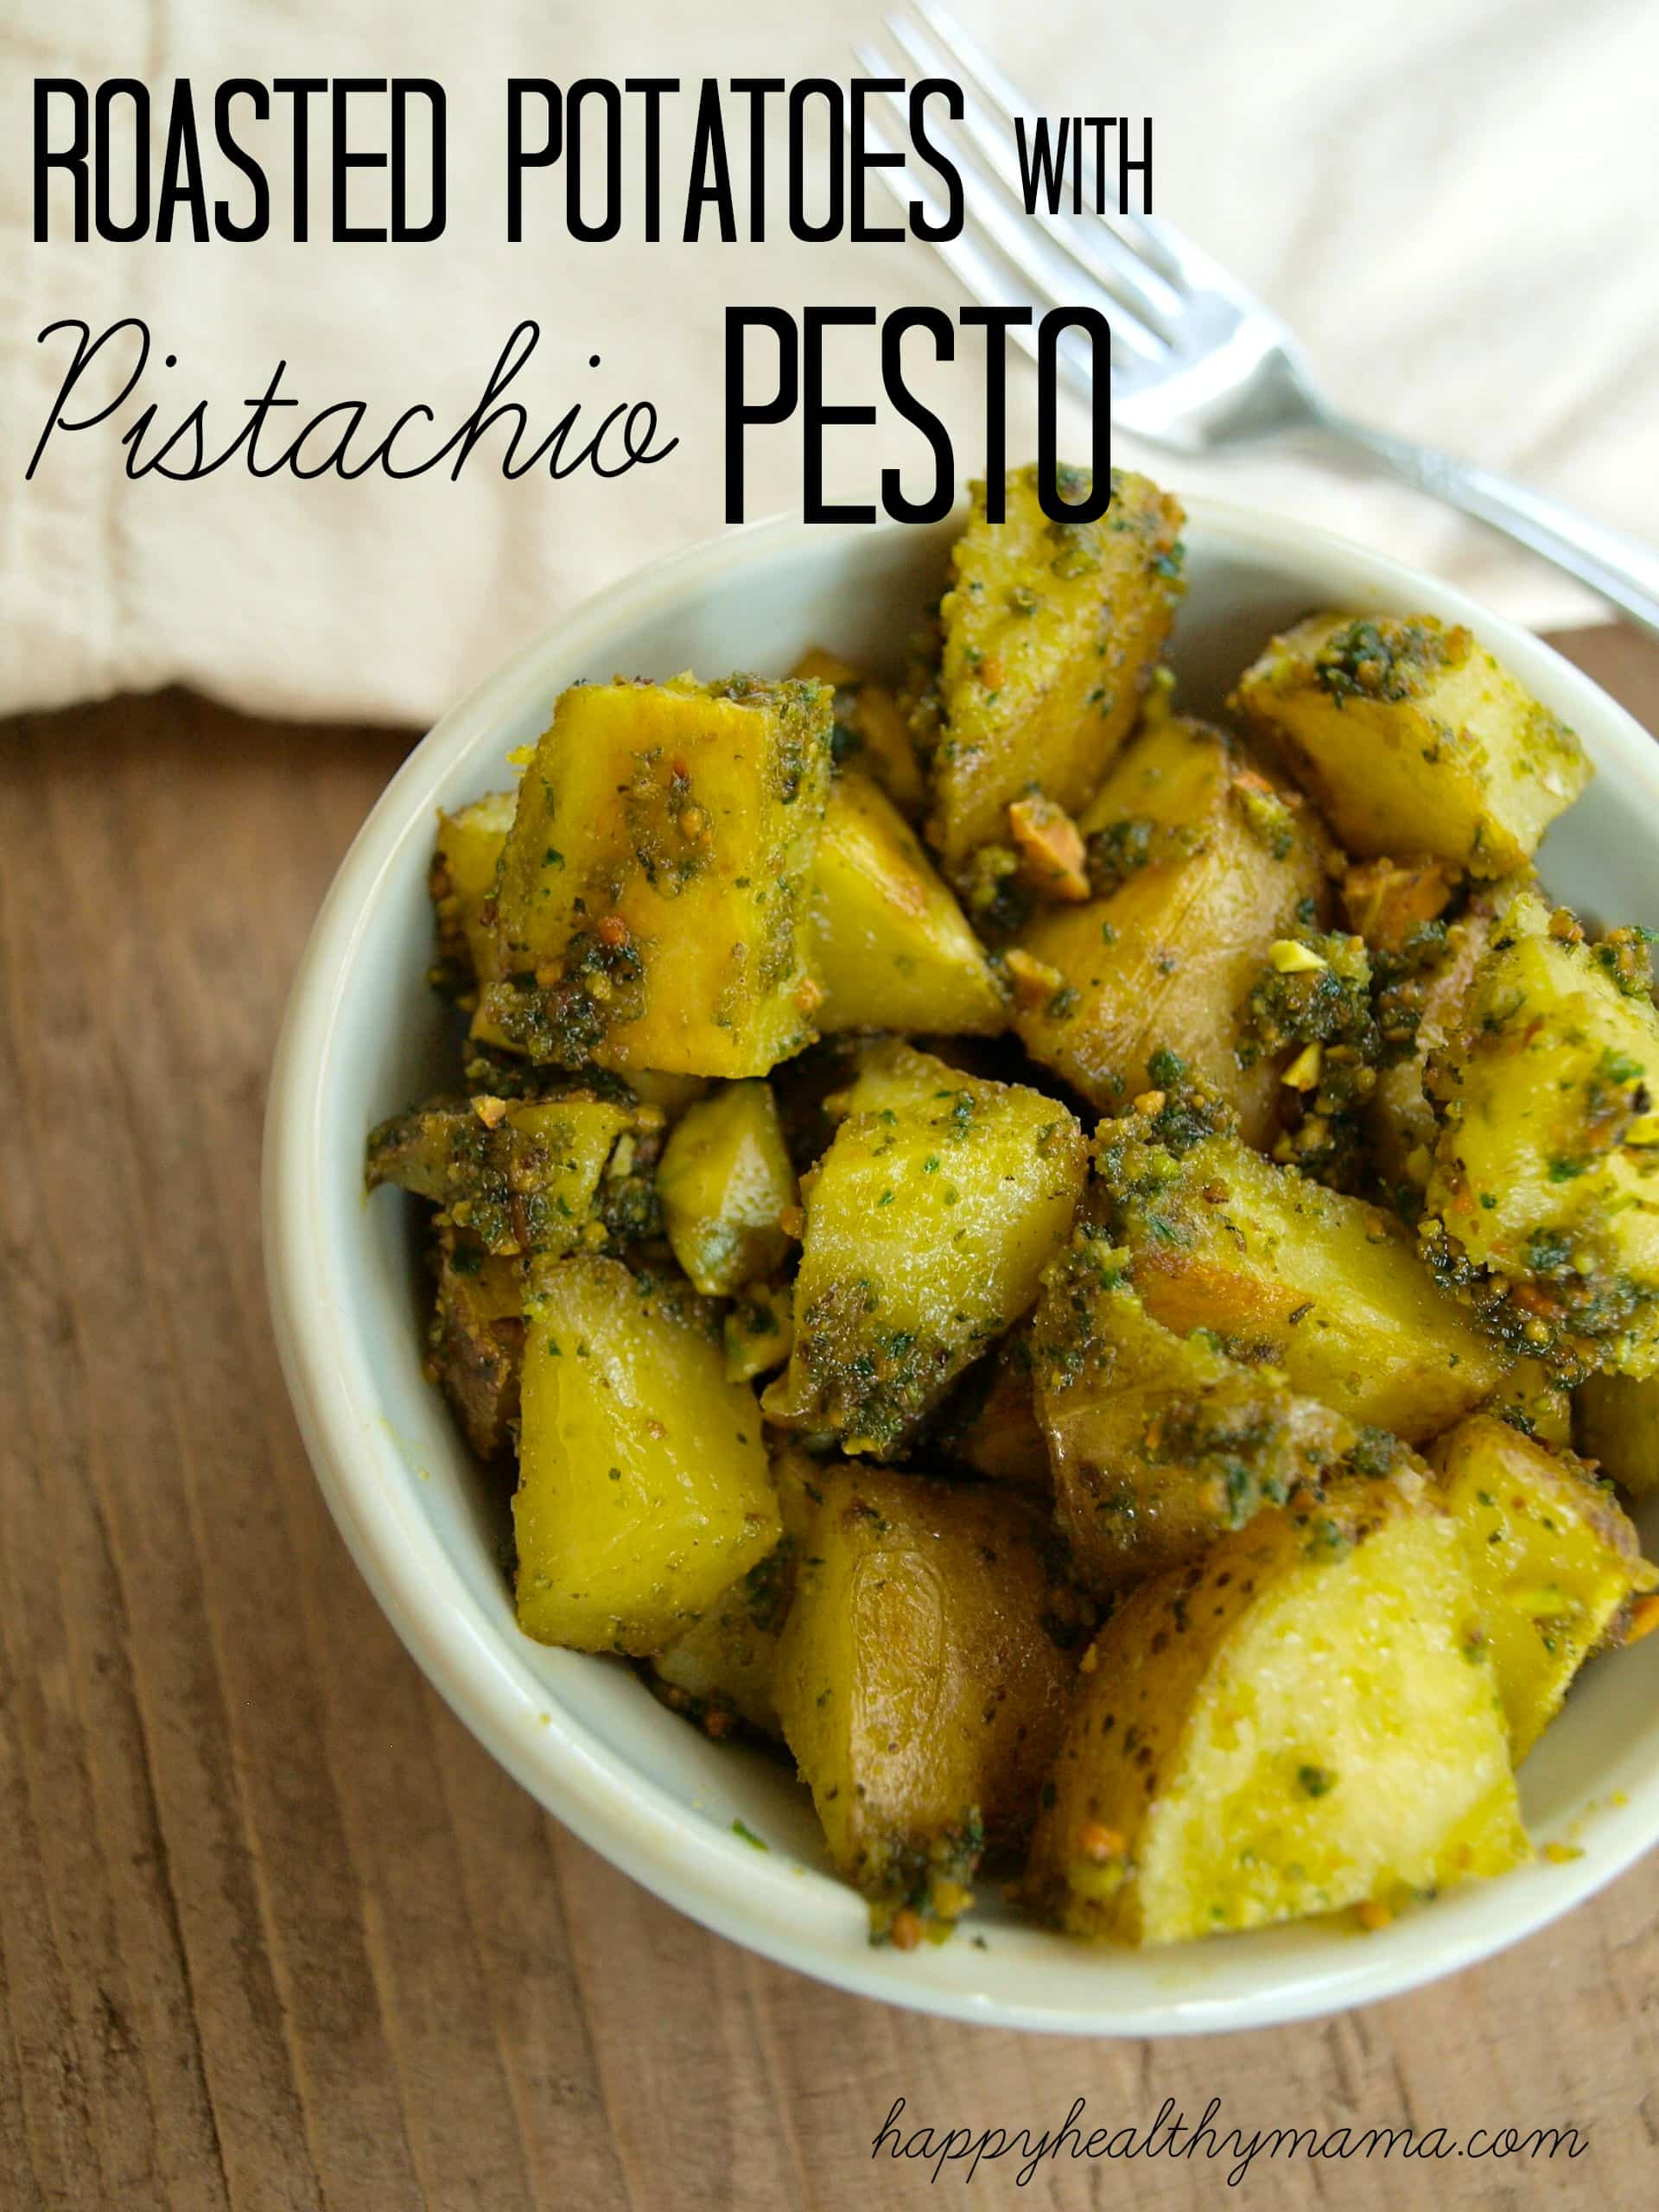 Roasted potatoes with pistachio pesto {vegan}